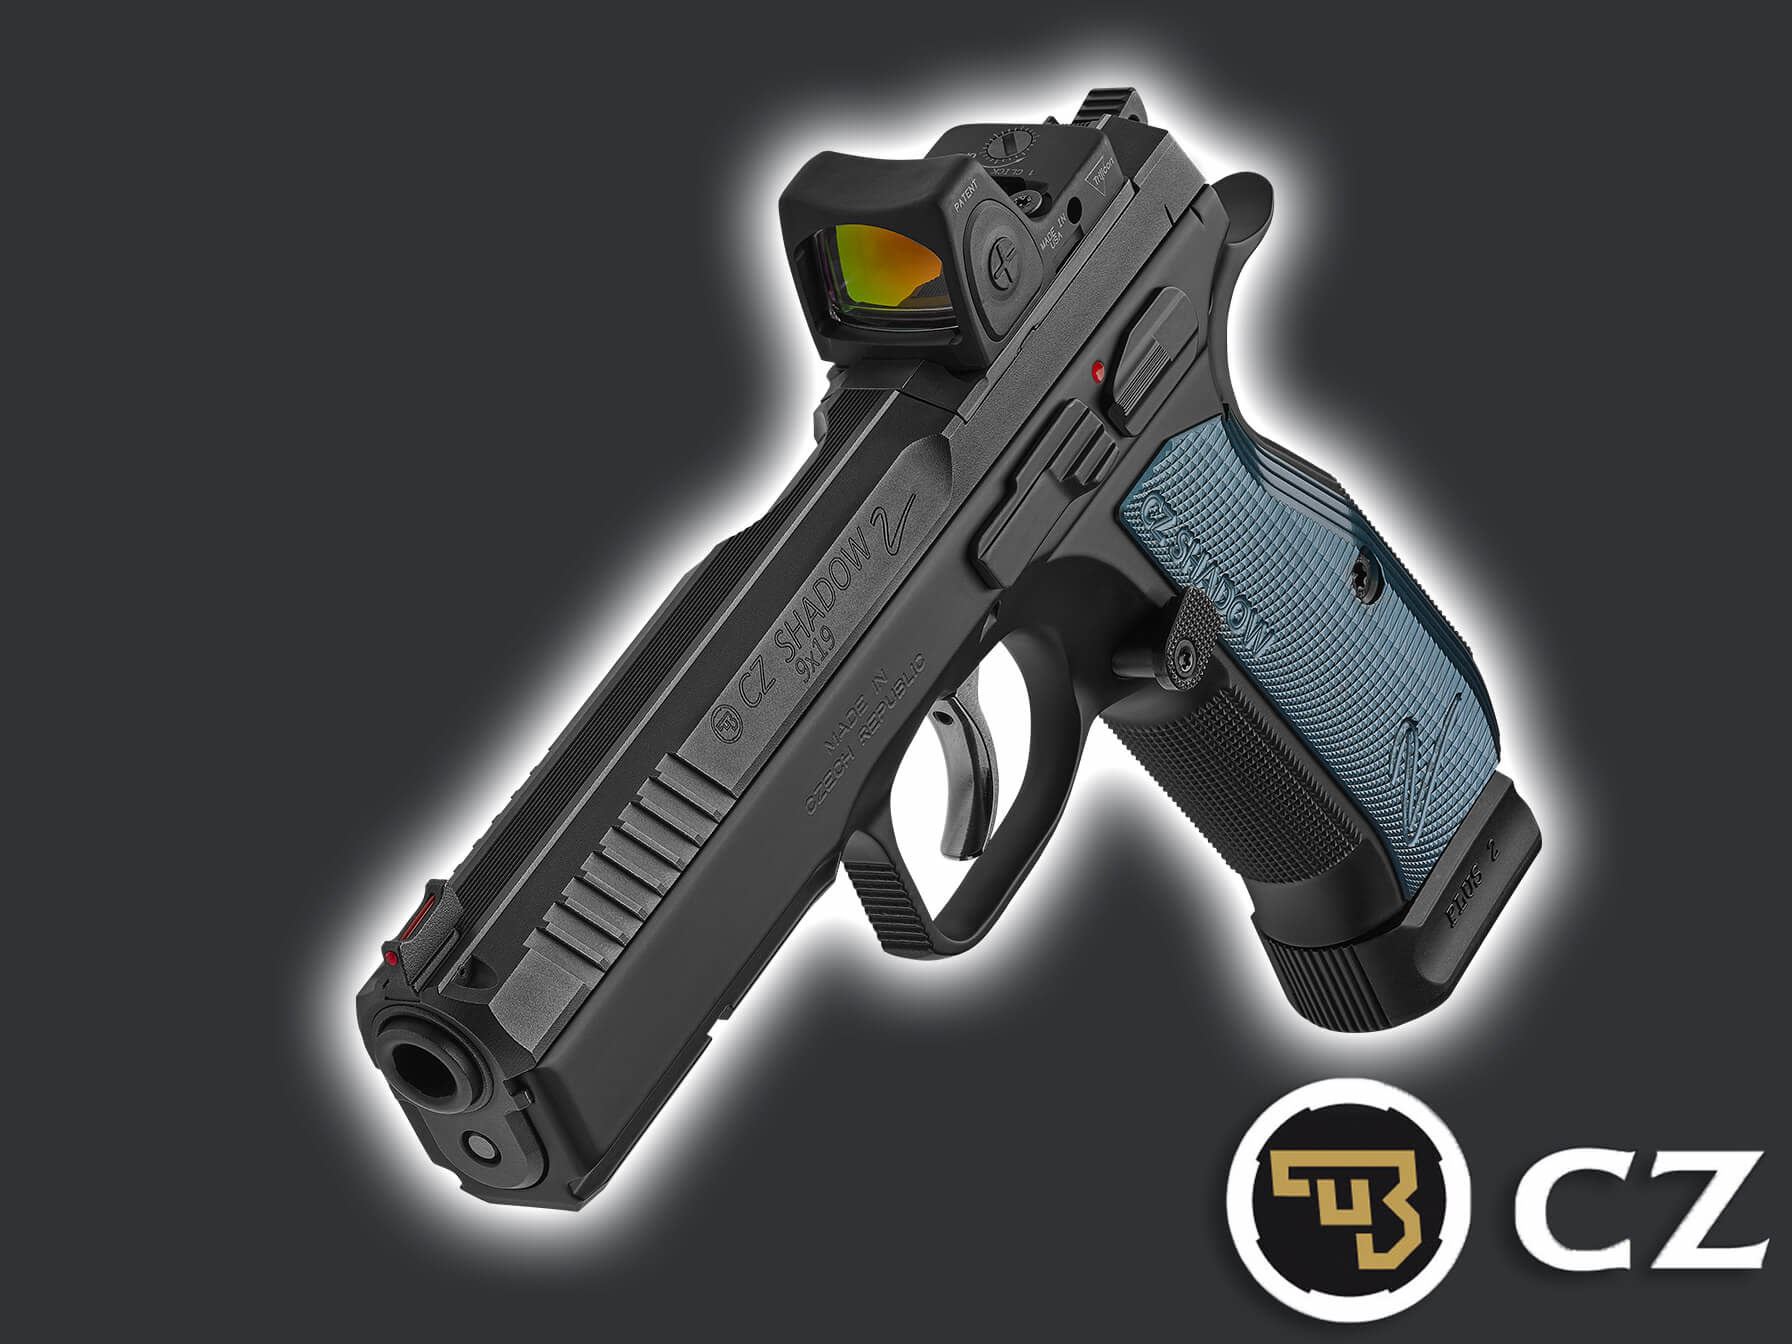 CZ75 SHADOW 2 OR OPTIC READY 9mm 120mmBL Blue Grip - Solely